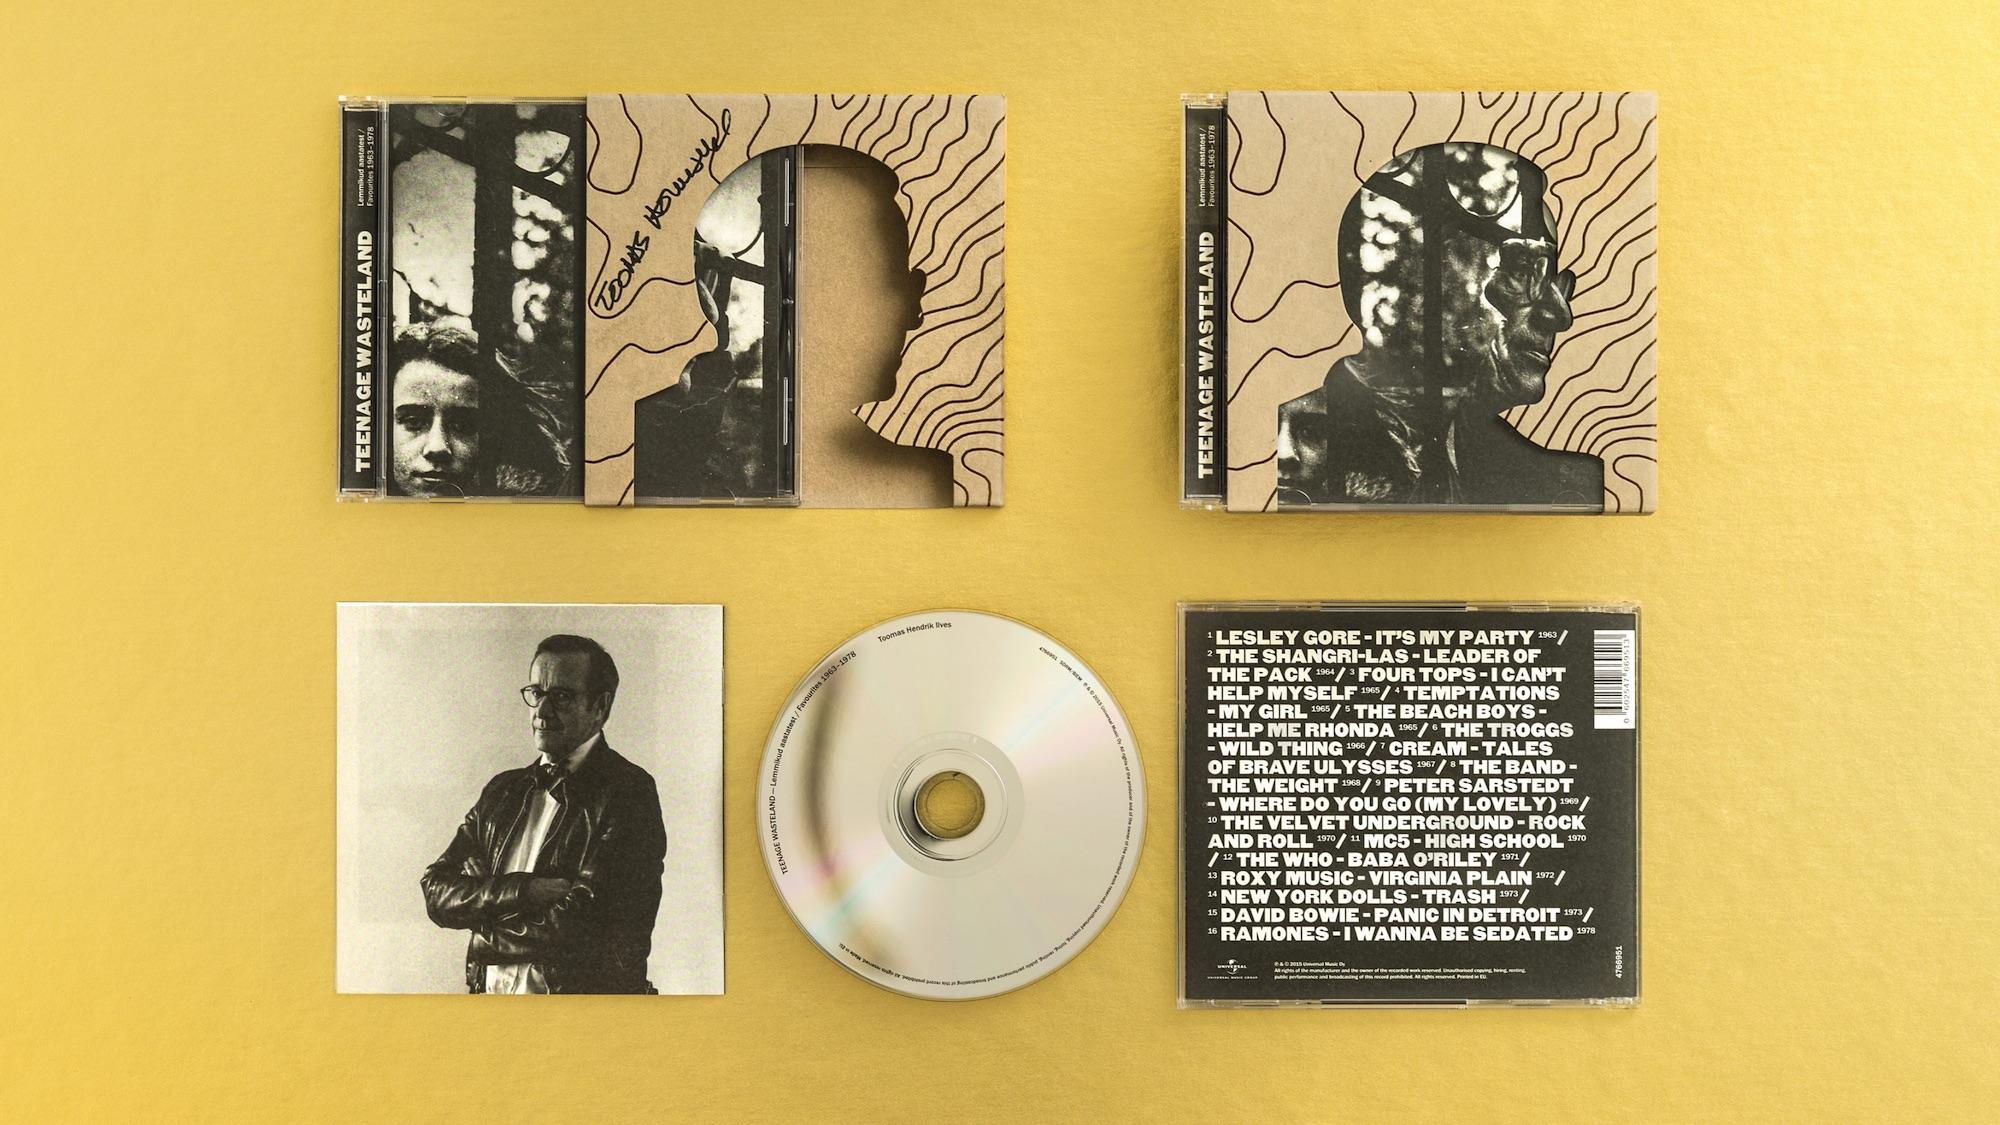 estonian president album packaging